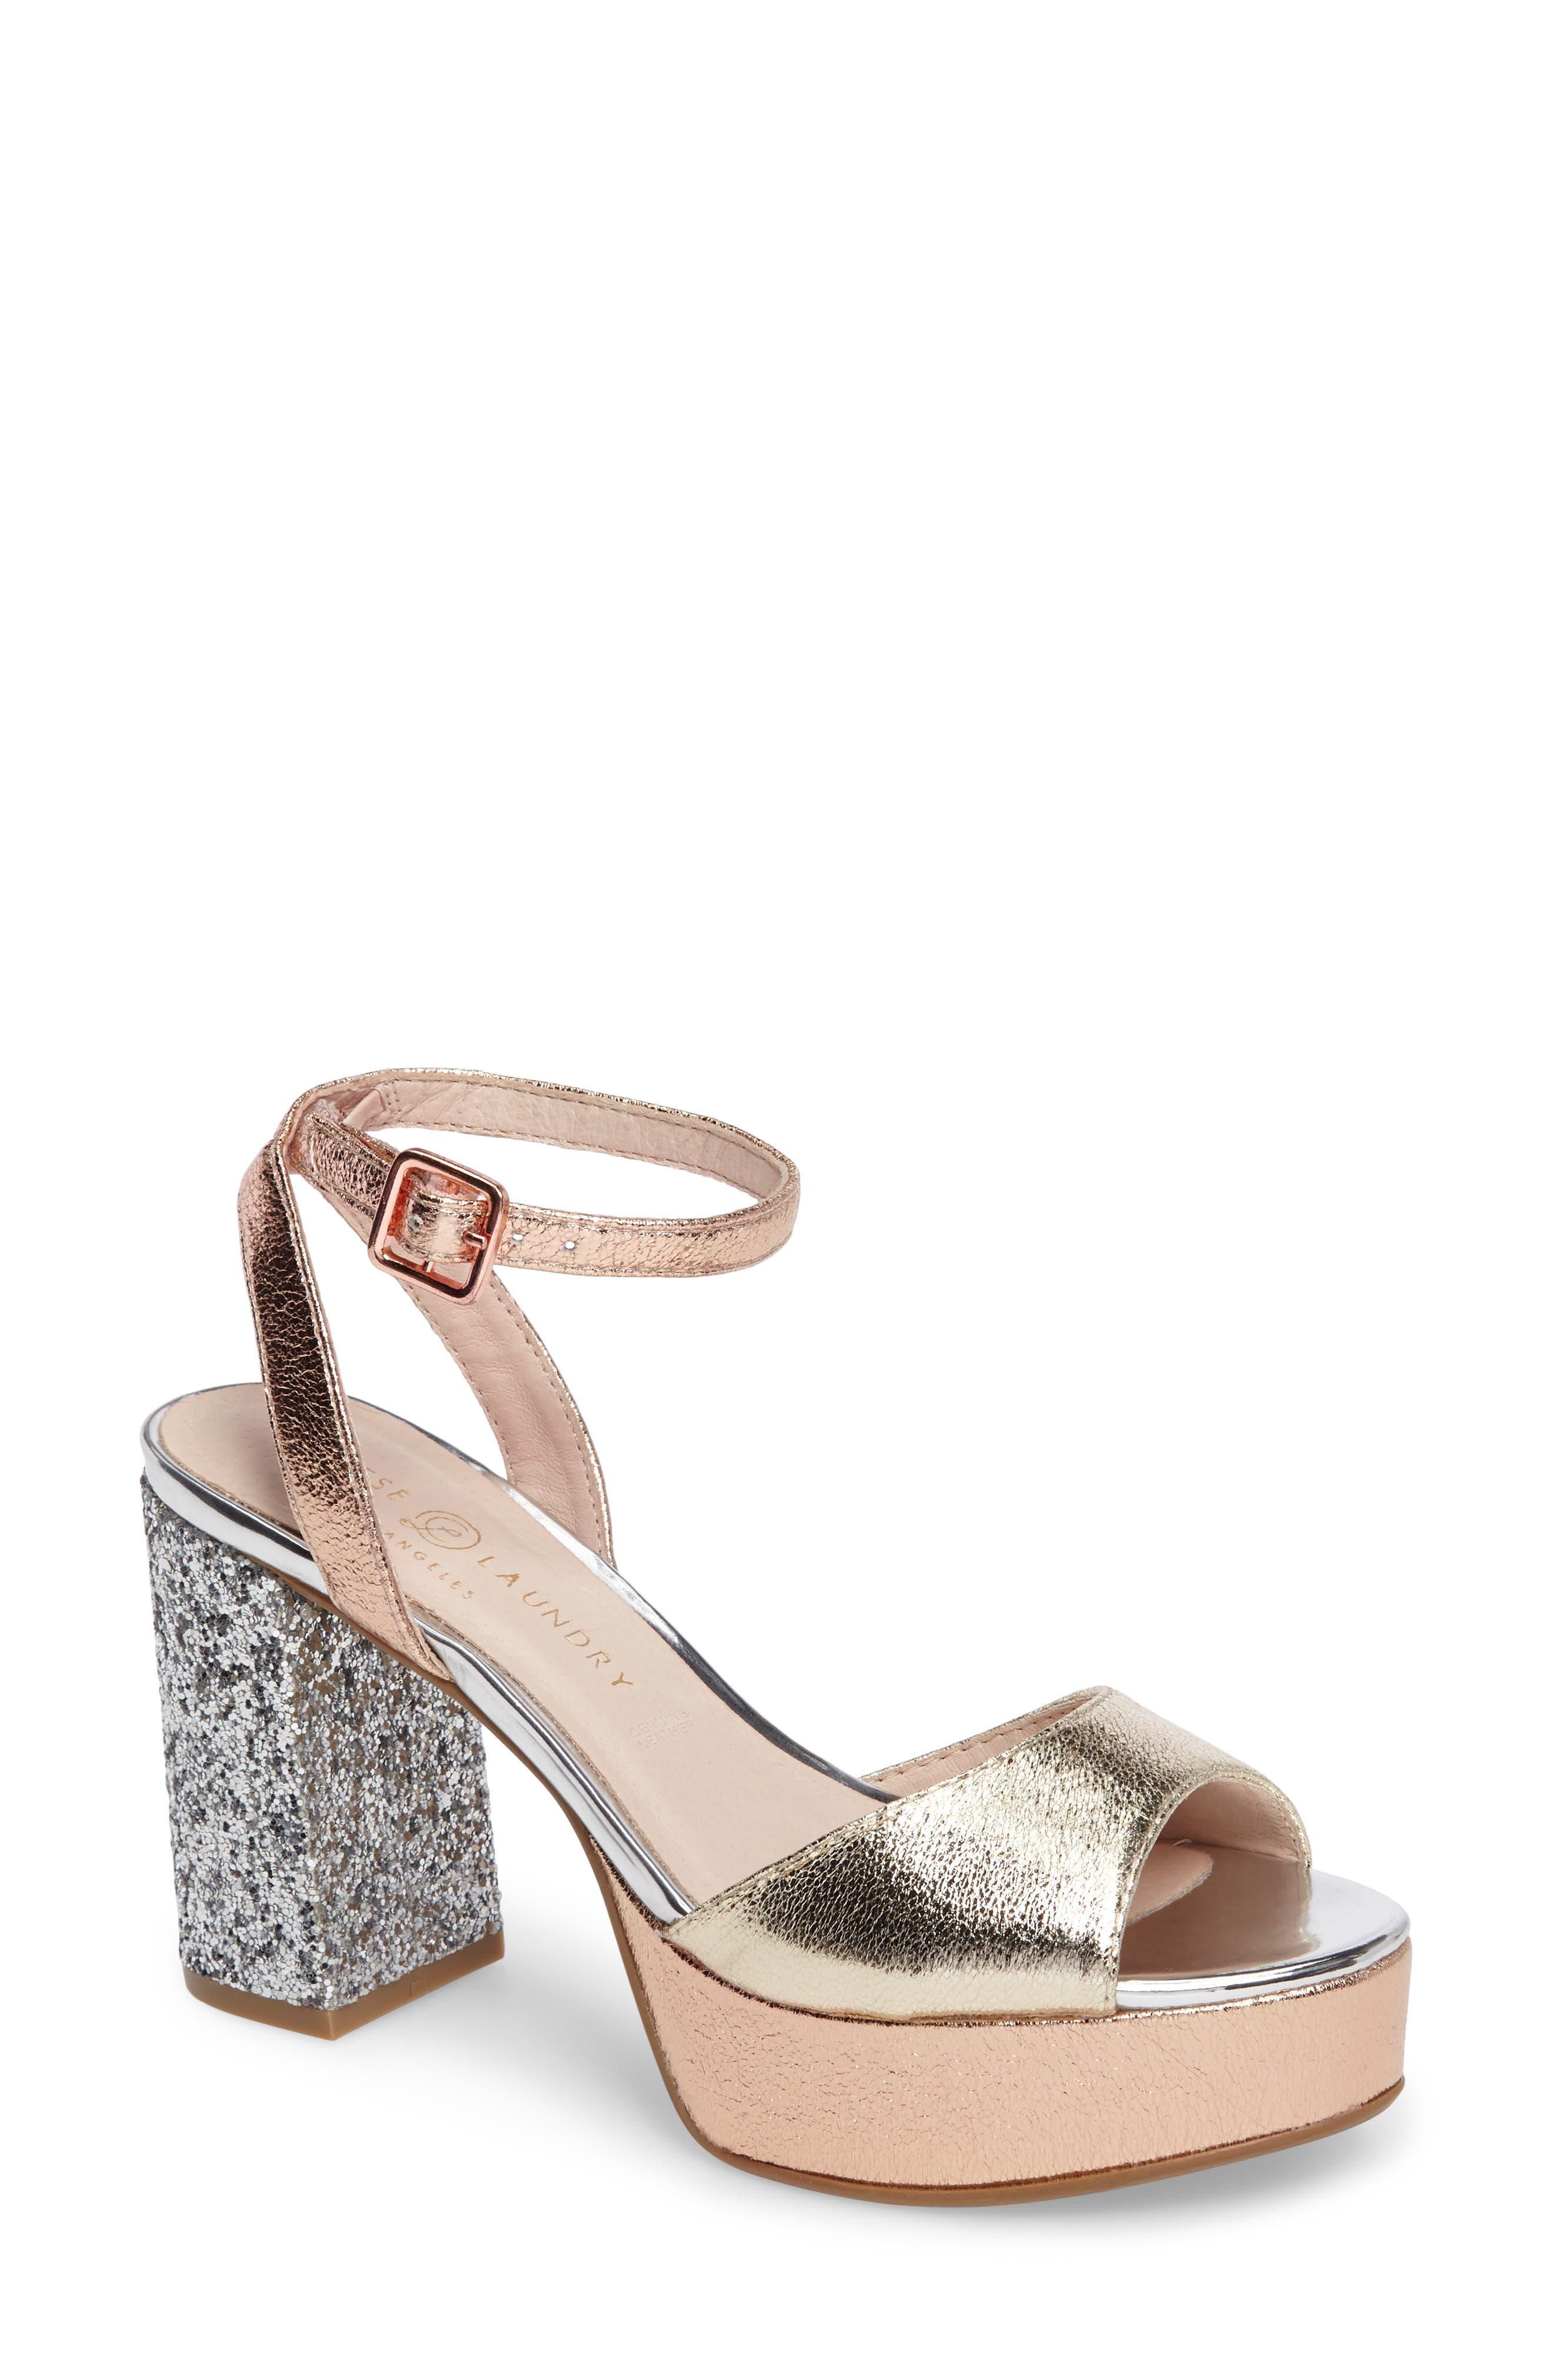 Alternate Image 1 Selected - Chinese Laundry Tayla Platform Sandal (Women)